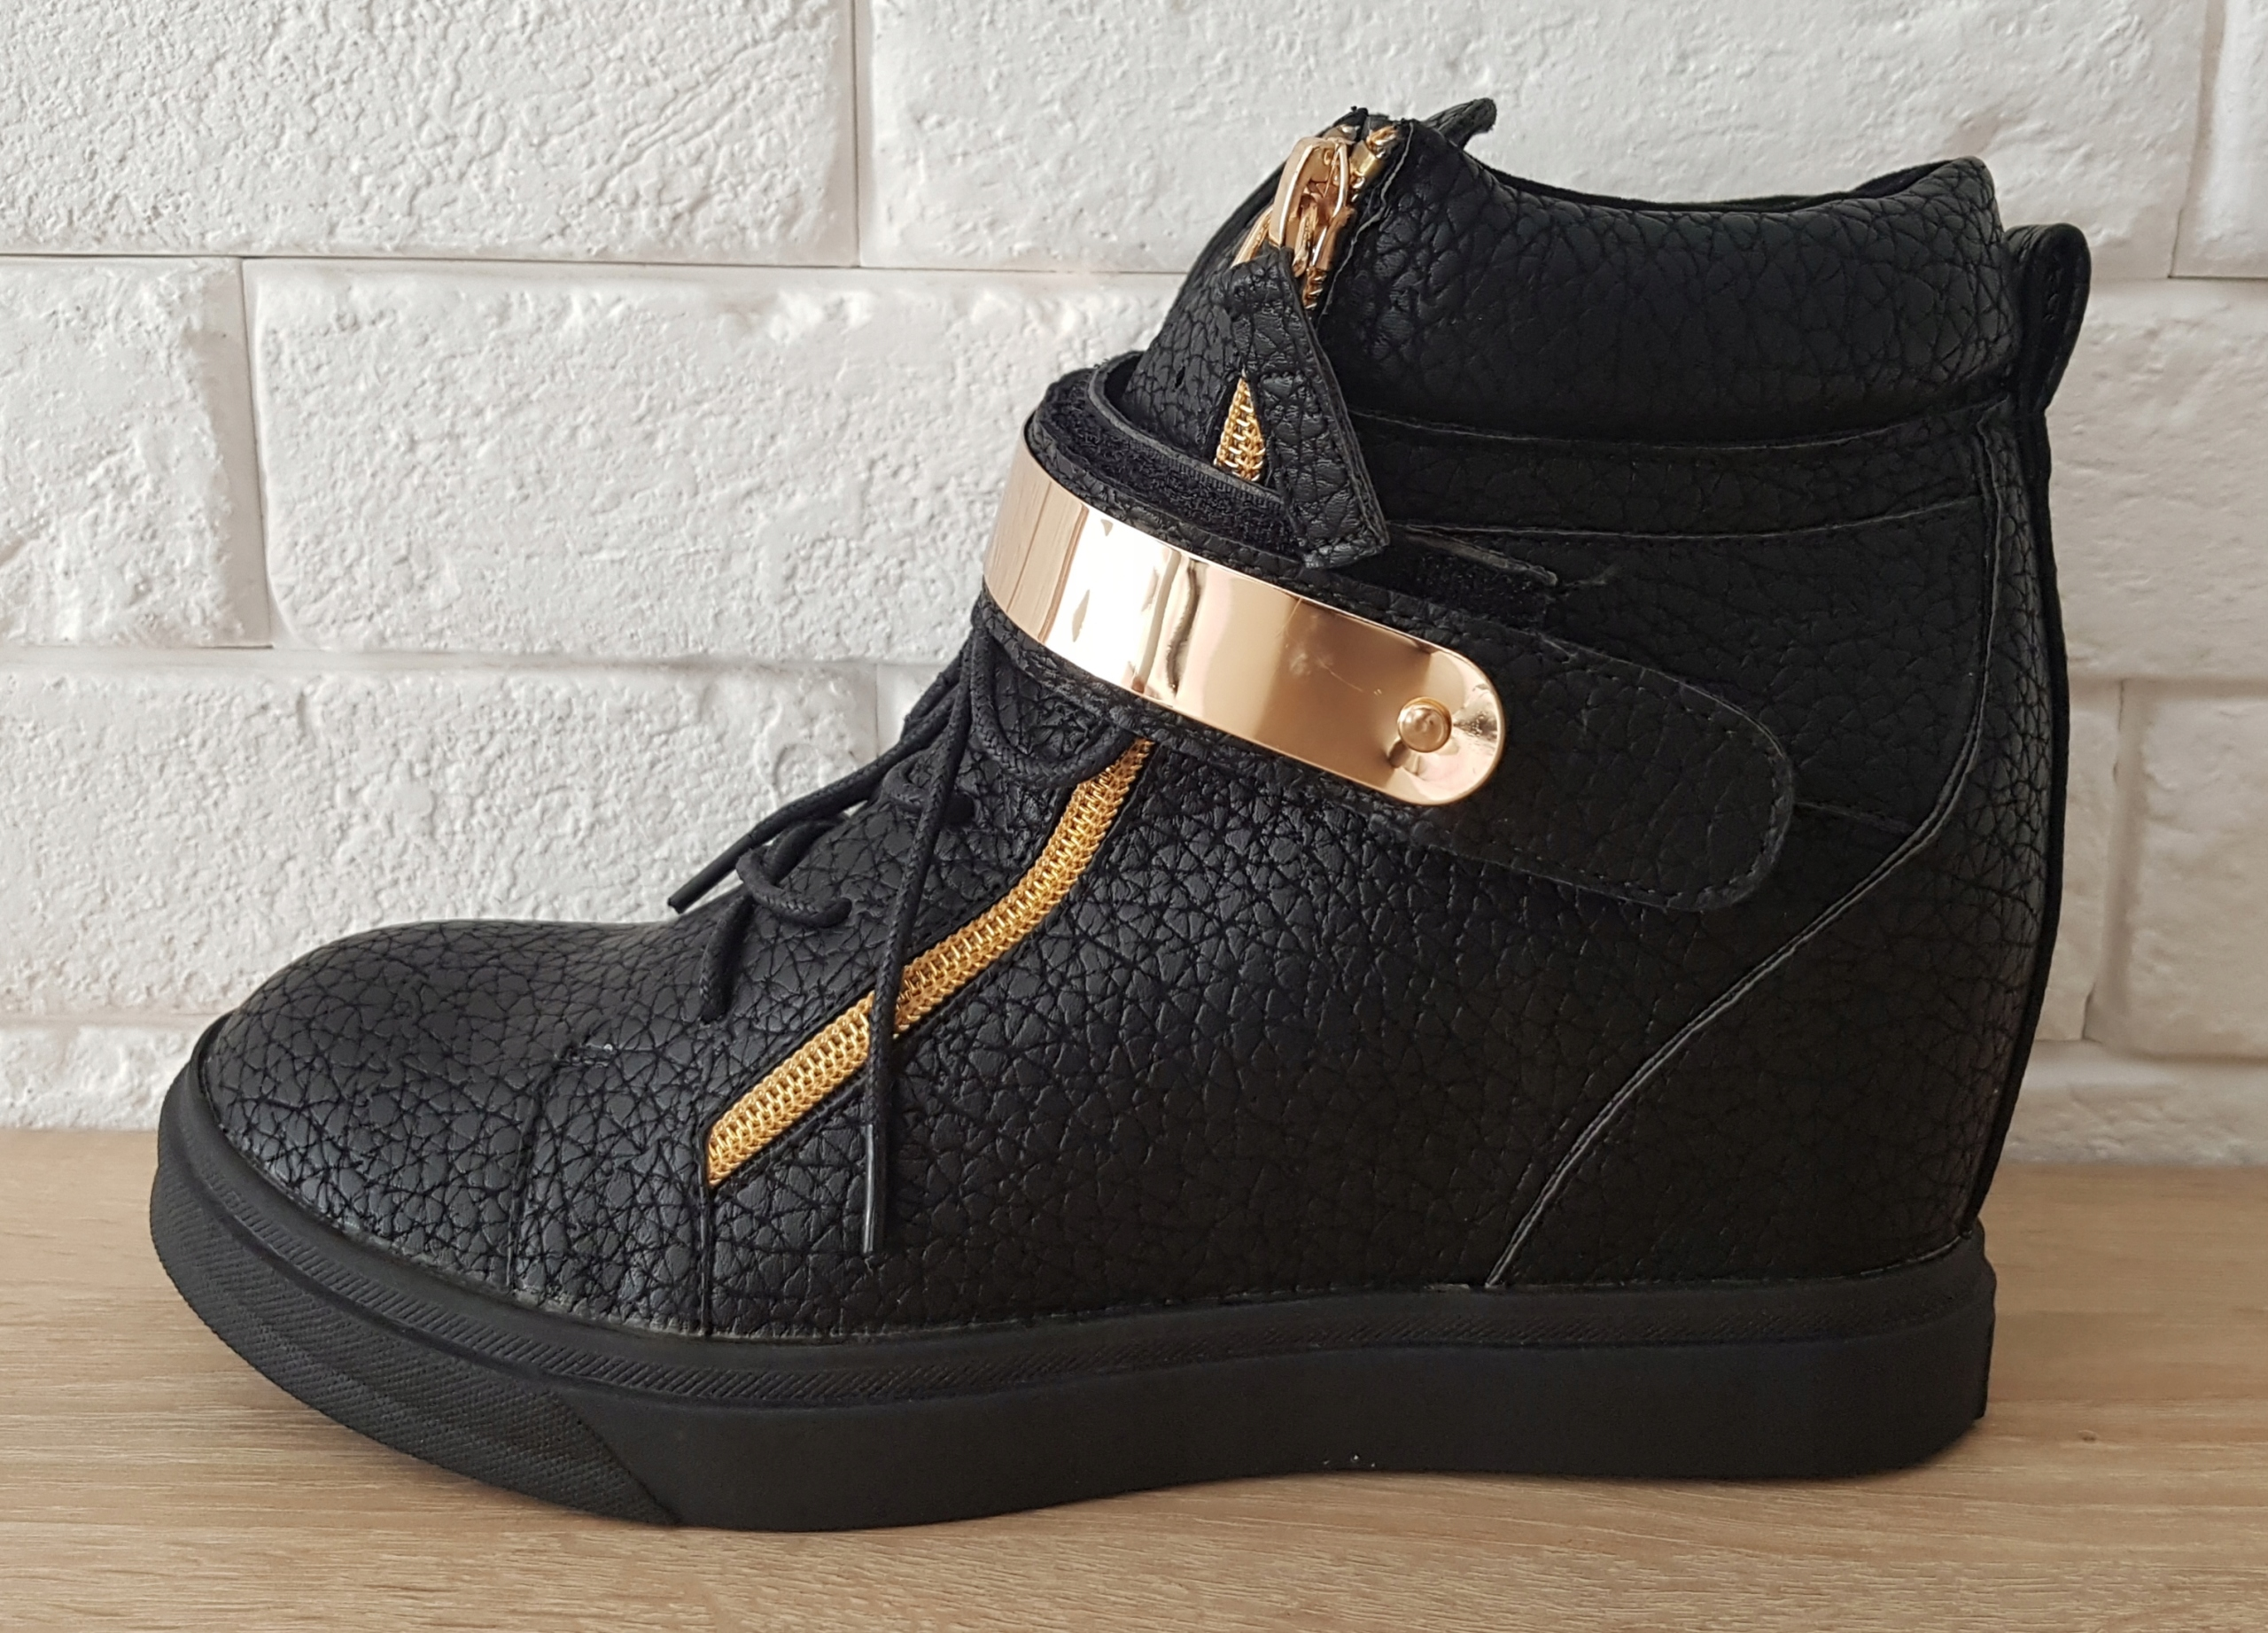 Modne sneakersy rozmiar 40